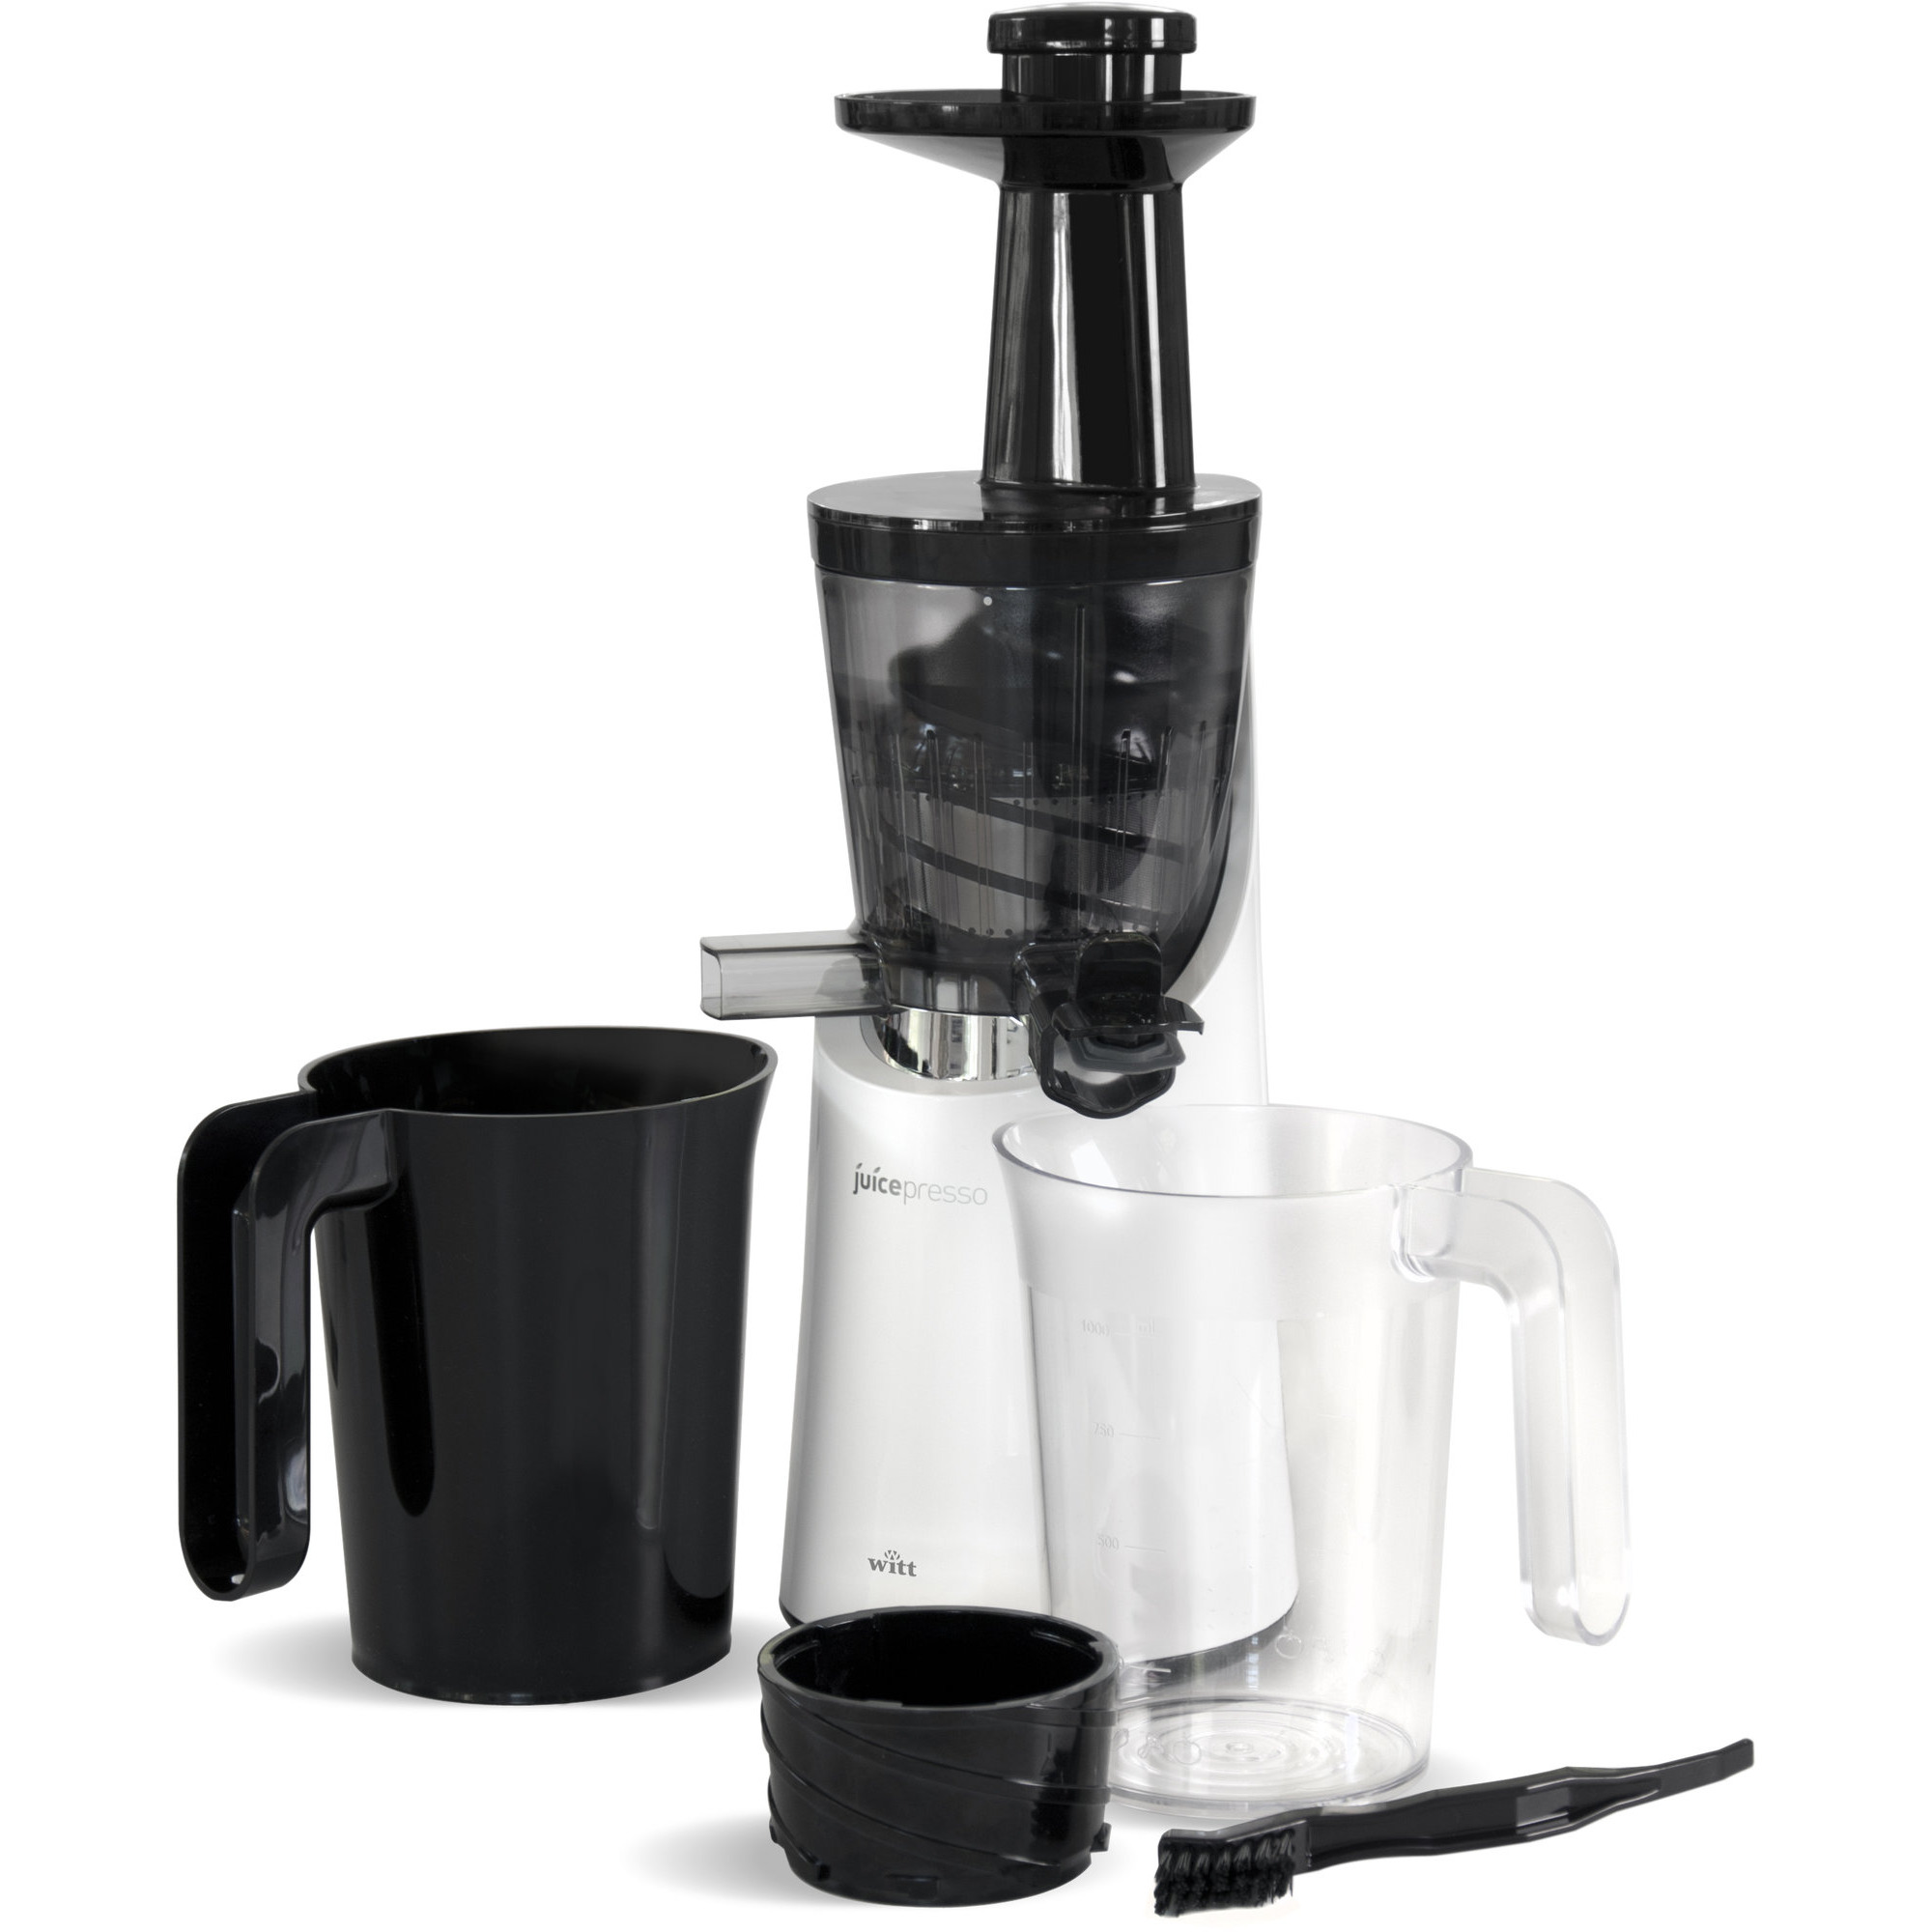 Witt Smoothie Juicepresso WJPW-E Vit